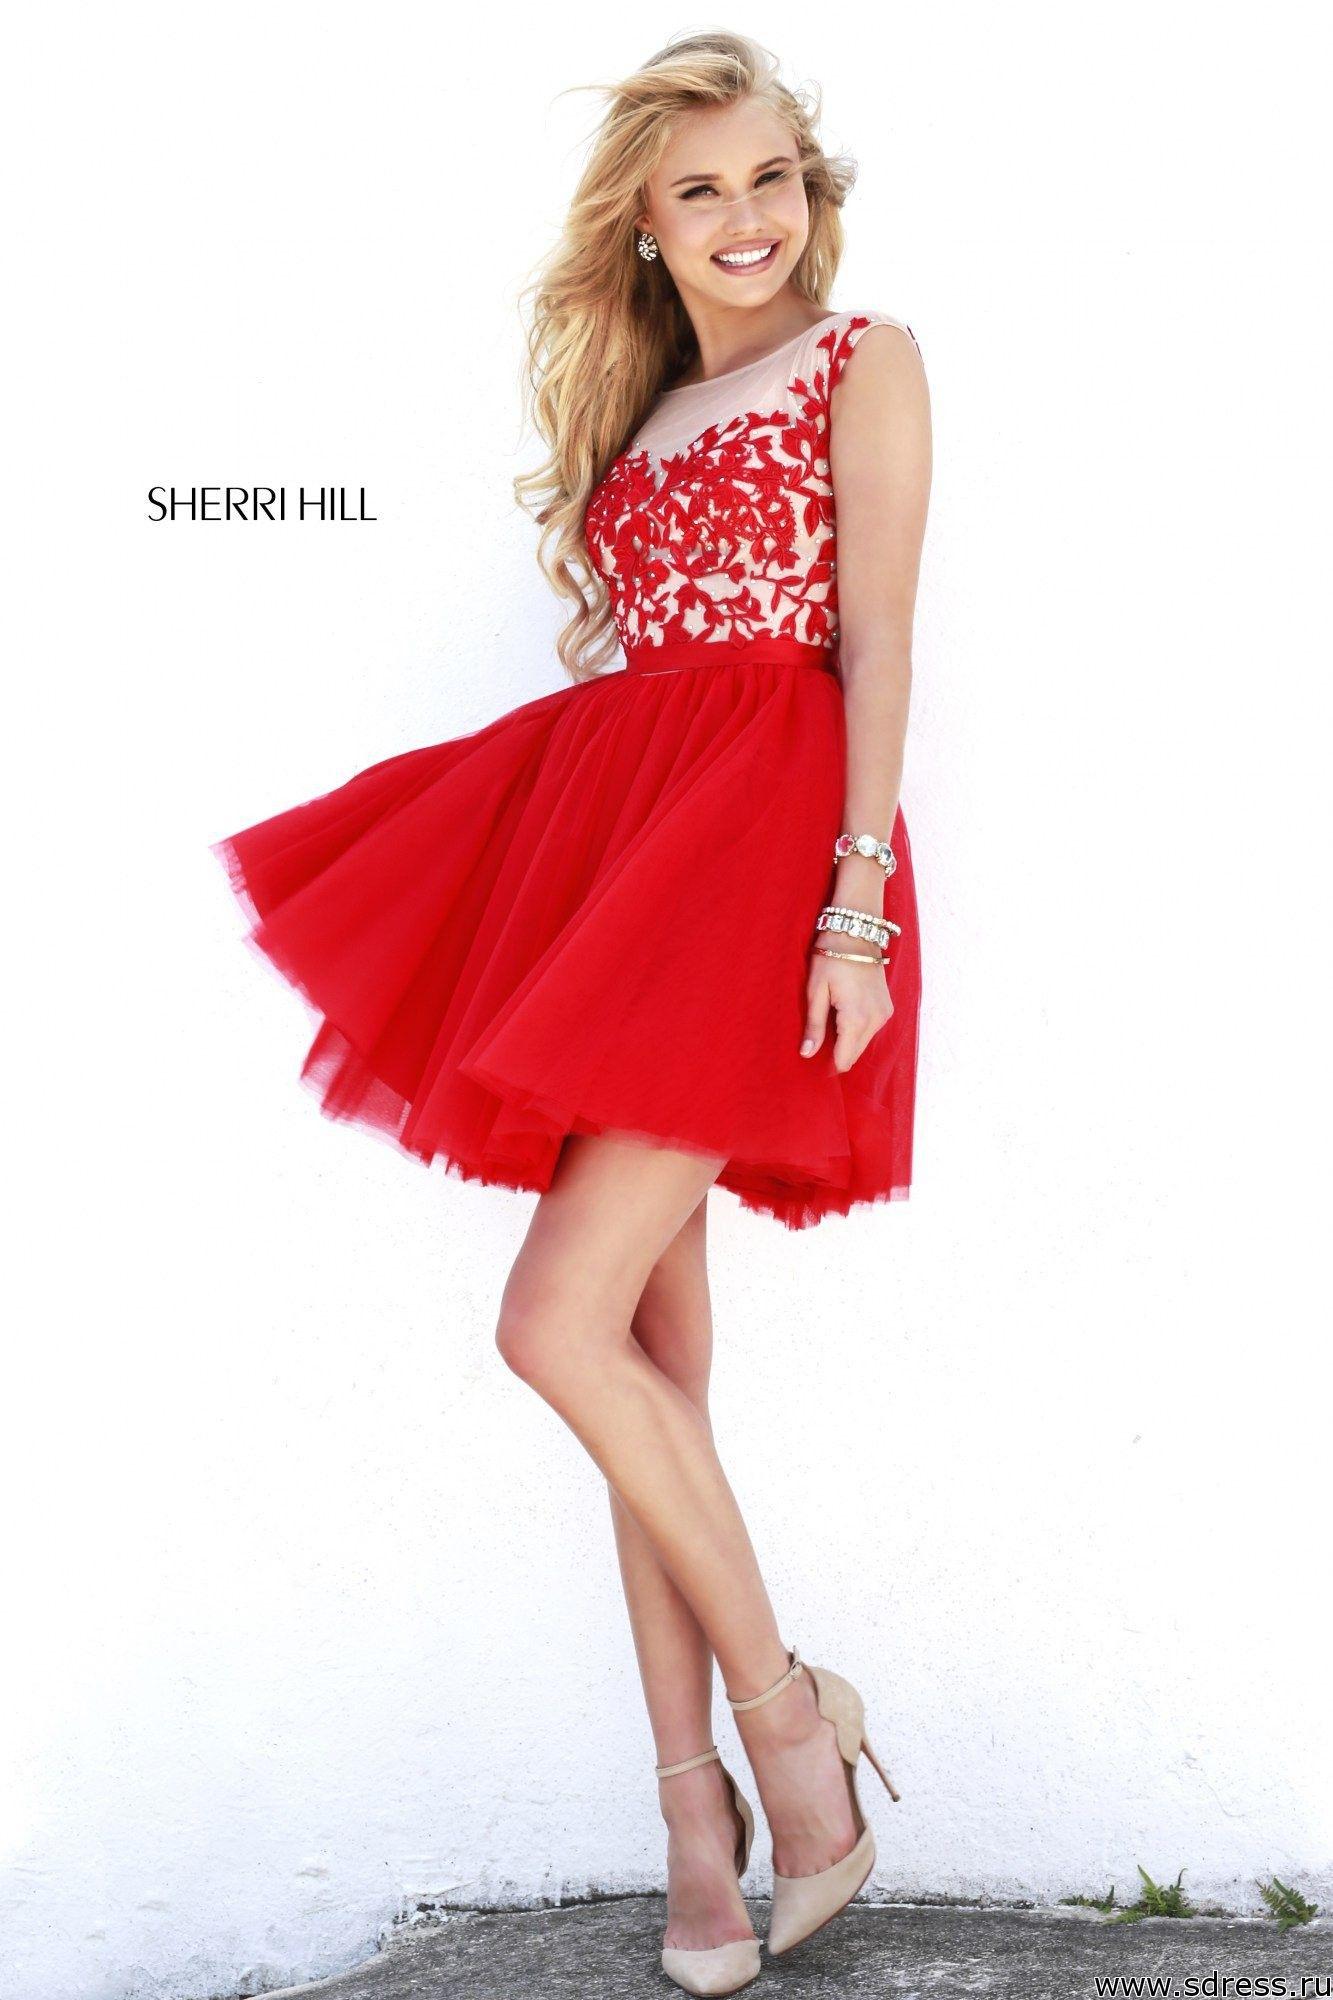 Sherri_Hill_11171_red_nude_11171_sherri_hill_20.jpg-1500x2000.jpg ...